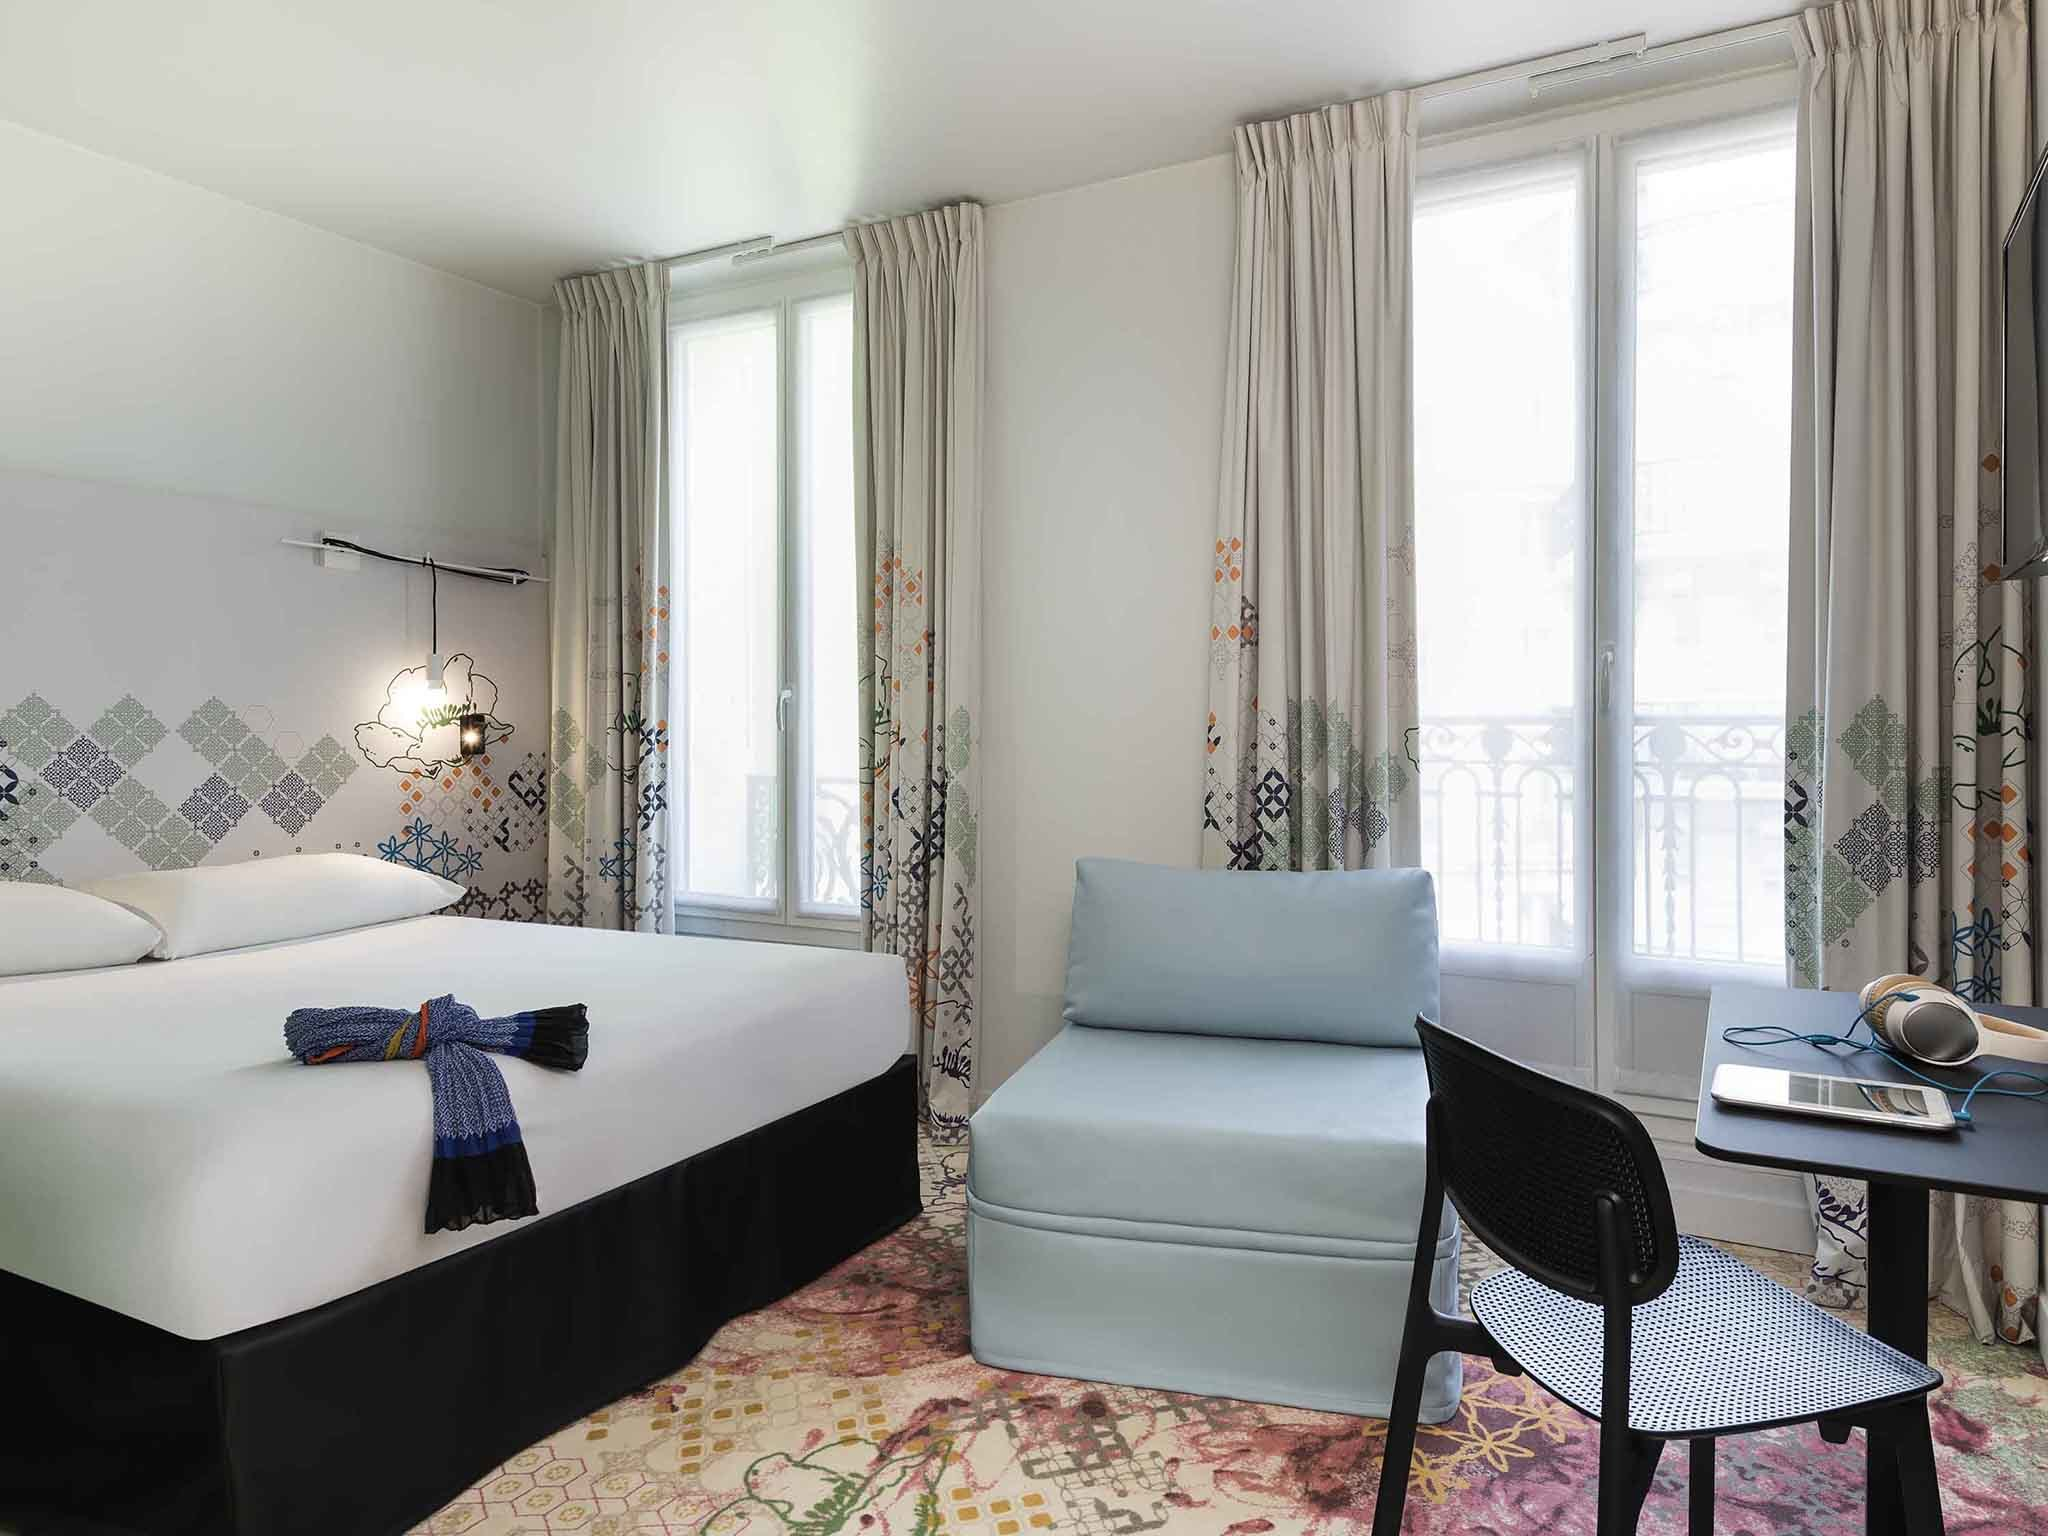 Ibis Styles Paris Gare Saint Lazare Hotel